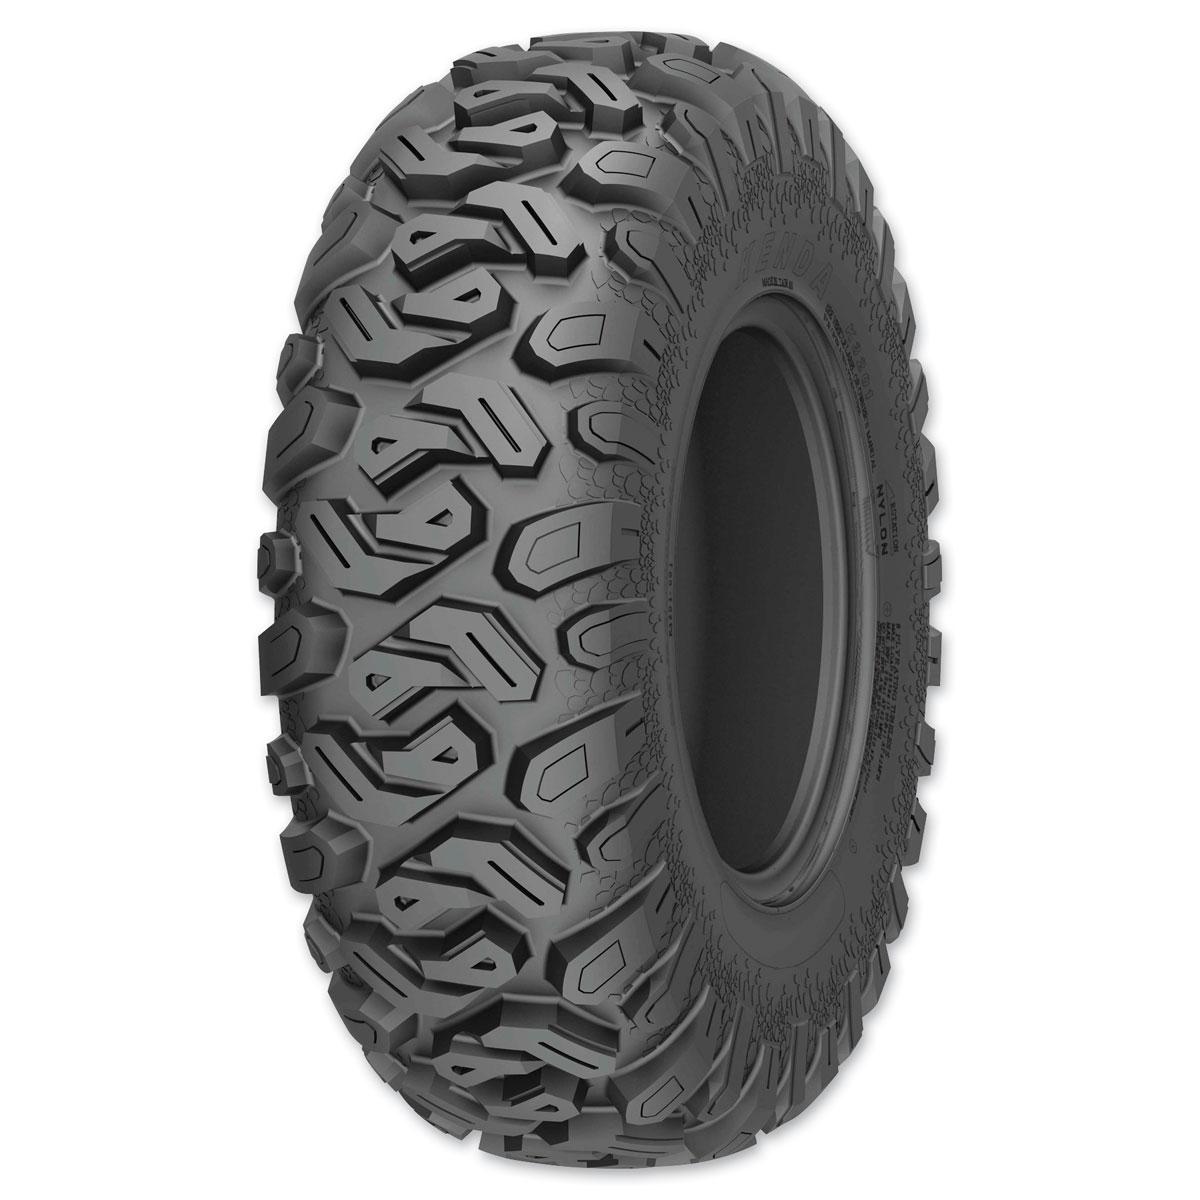 Kenda Tires Mastodon 26X11R-12 Front/Rear Tire